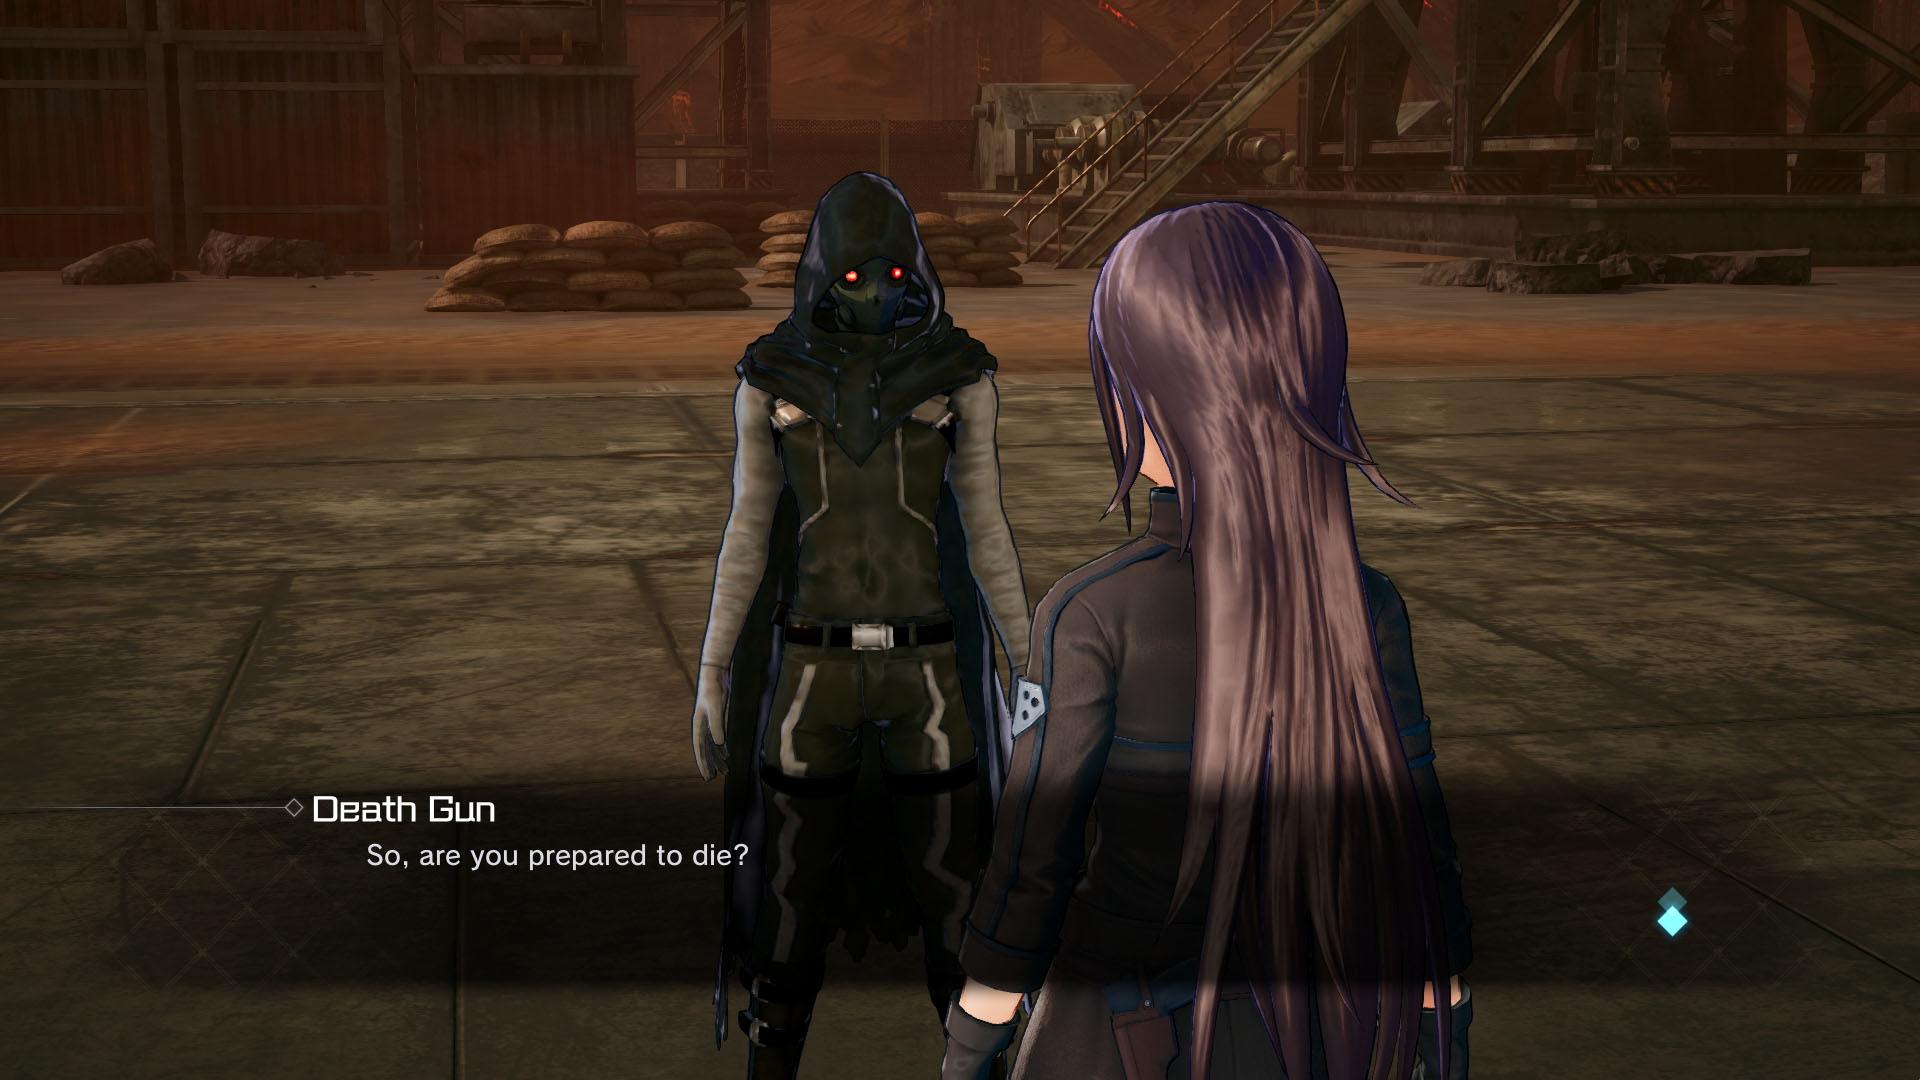 Скриншот 0 - Sword Art Online: Fatal Bullet (Оффлайн активация) Deluxe Edition